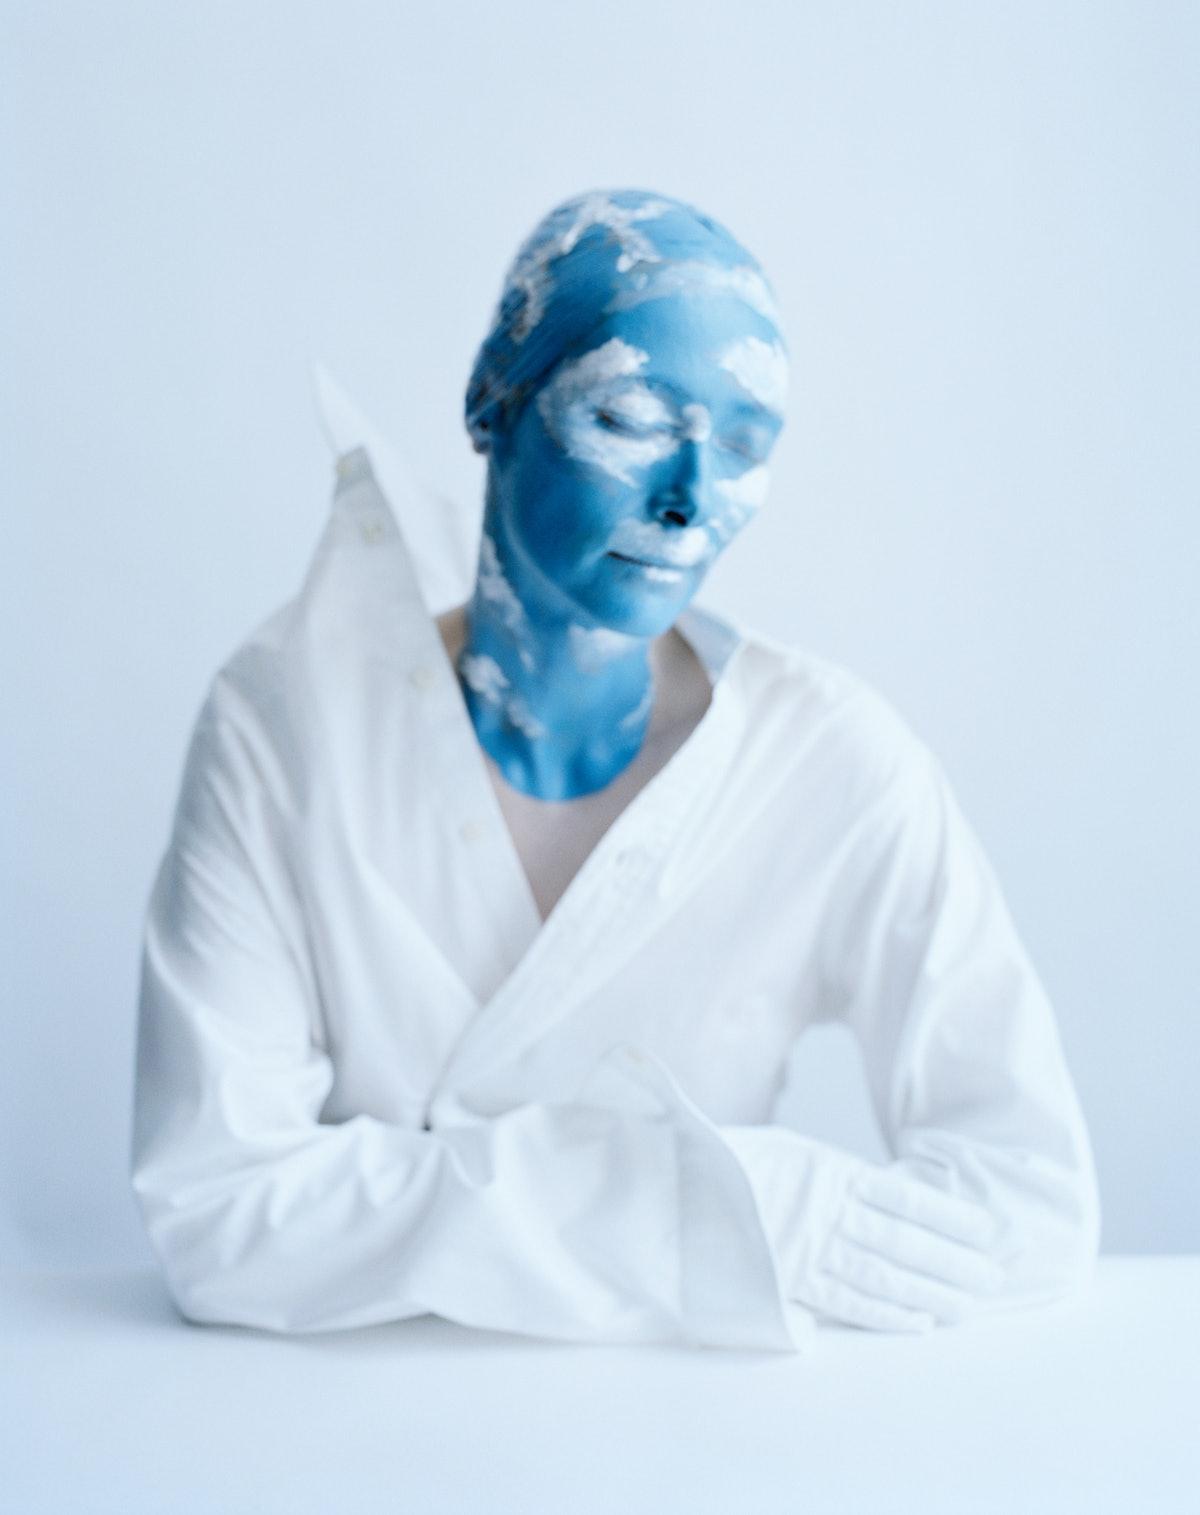 Tilda Swinton as Mother Nature by Tim Walker